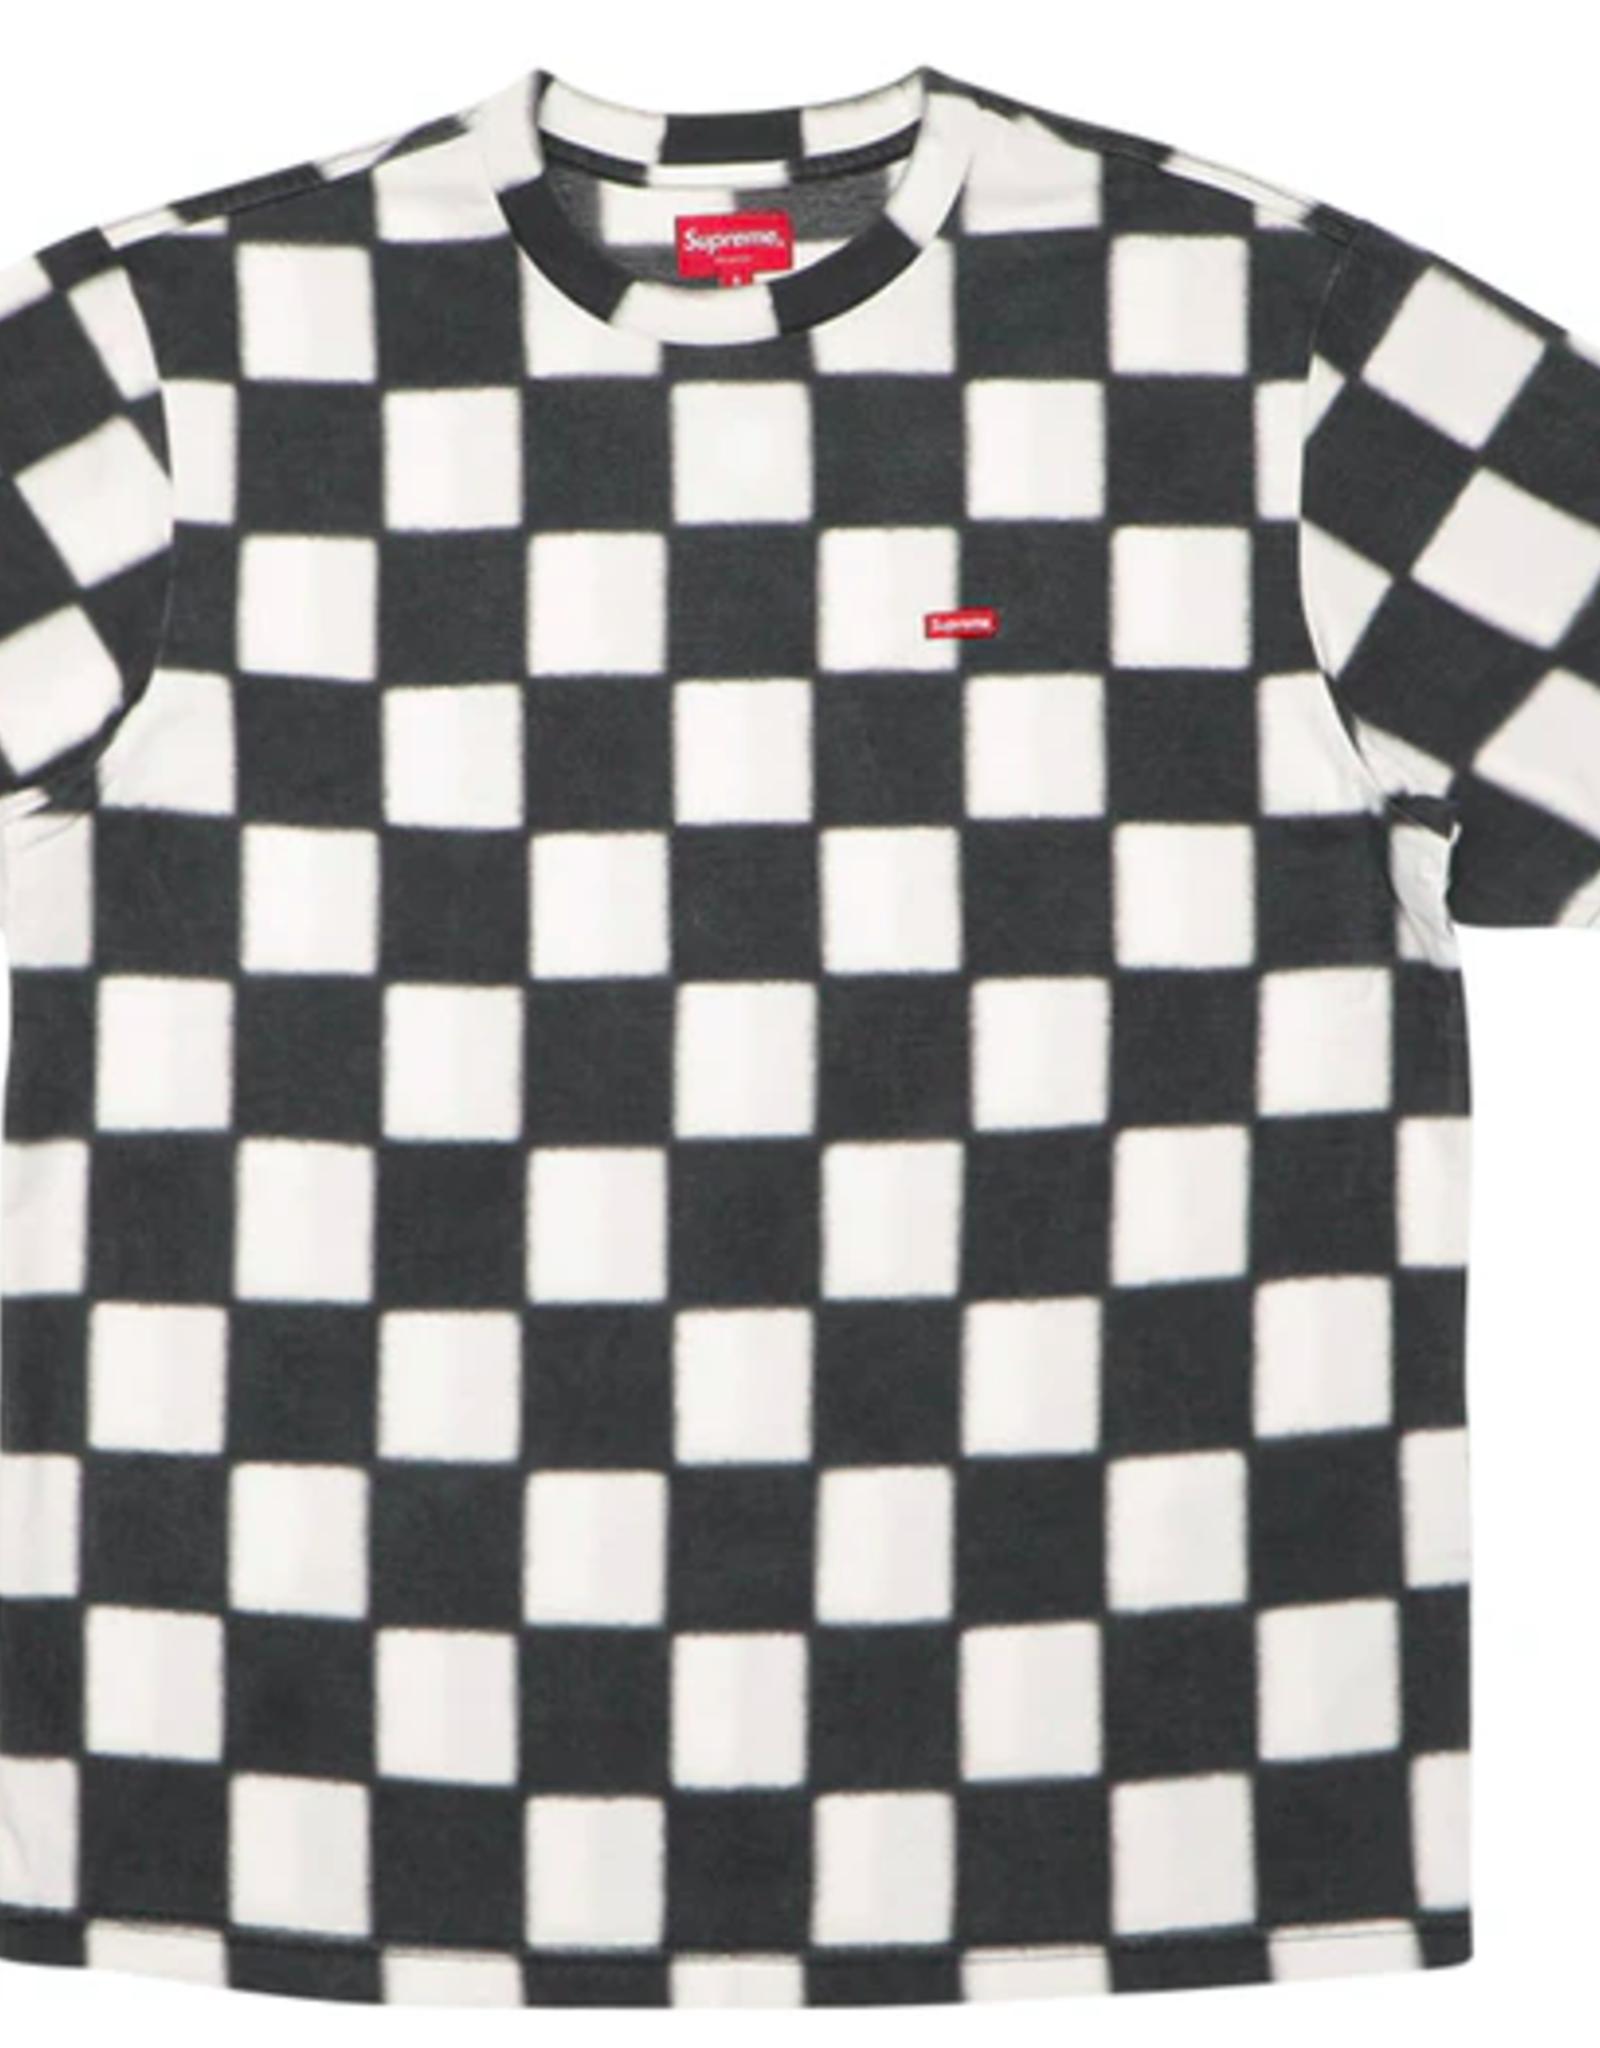 SUPREME Small Box Tee (SS20) Checkerboard MED